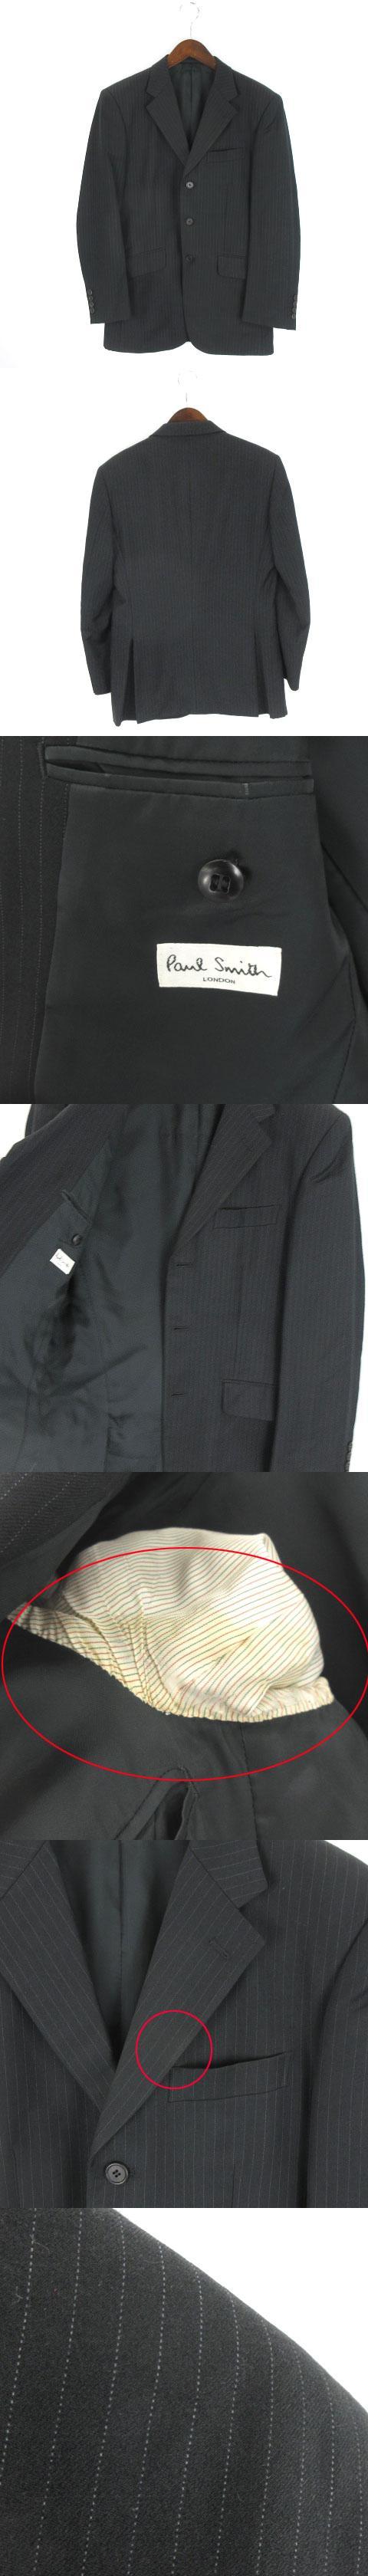 FRATELLI TALLIA DI DELFINO テーラード ジャケット ウール ストライプ シングル 3B 黒 ブラック M